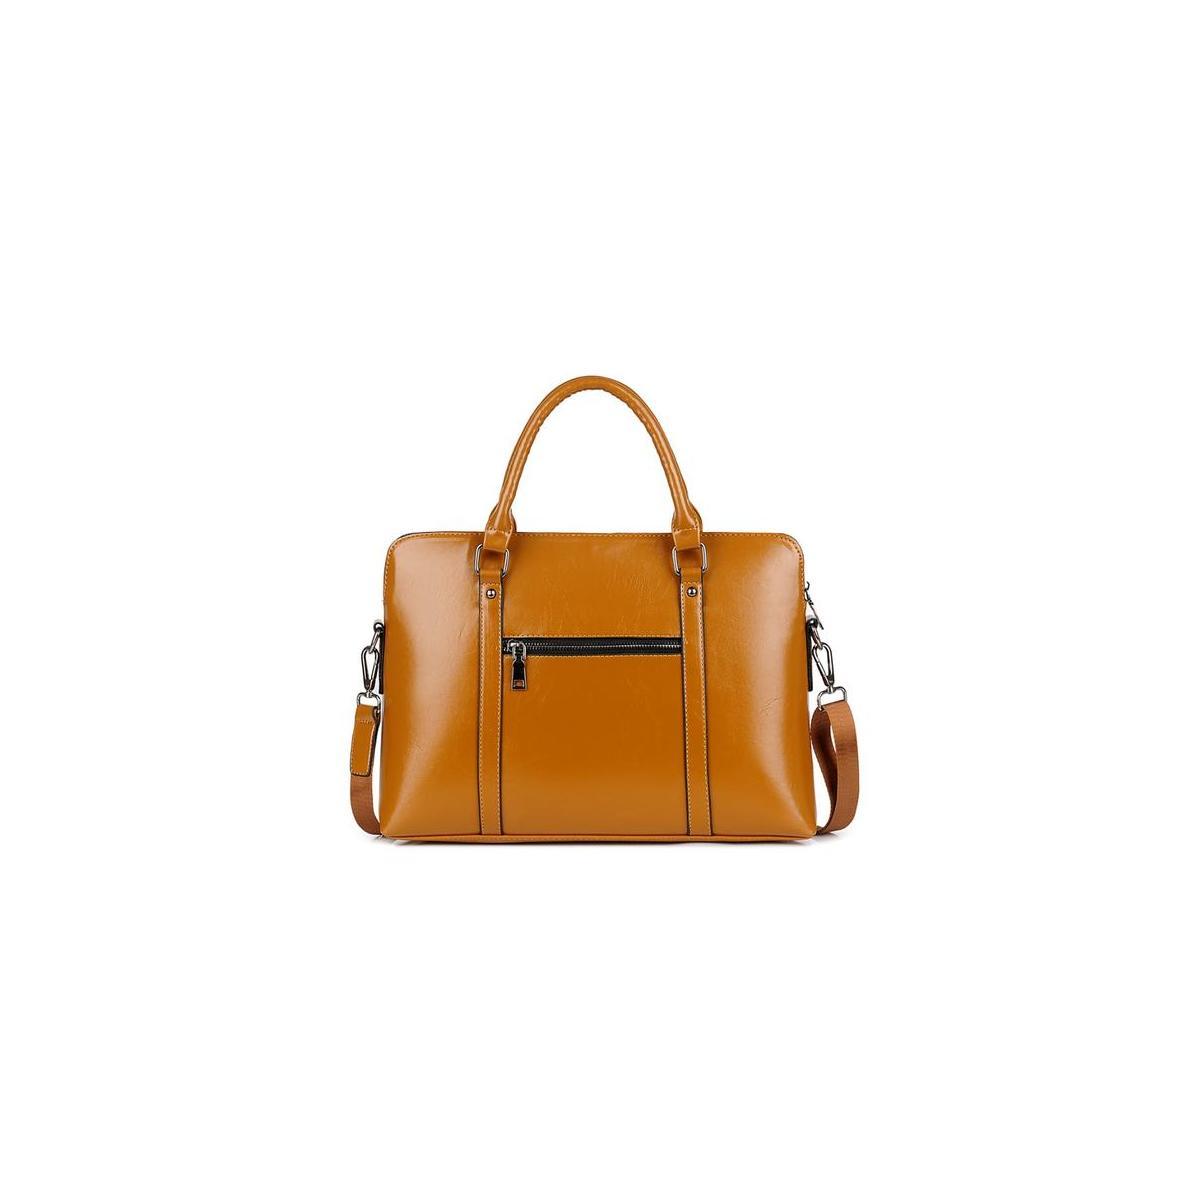 "16.5"" leather convertible large tote Laptop messenger satchel briefcase work shoulder crossbody computer bag/purse"